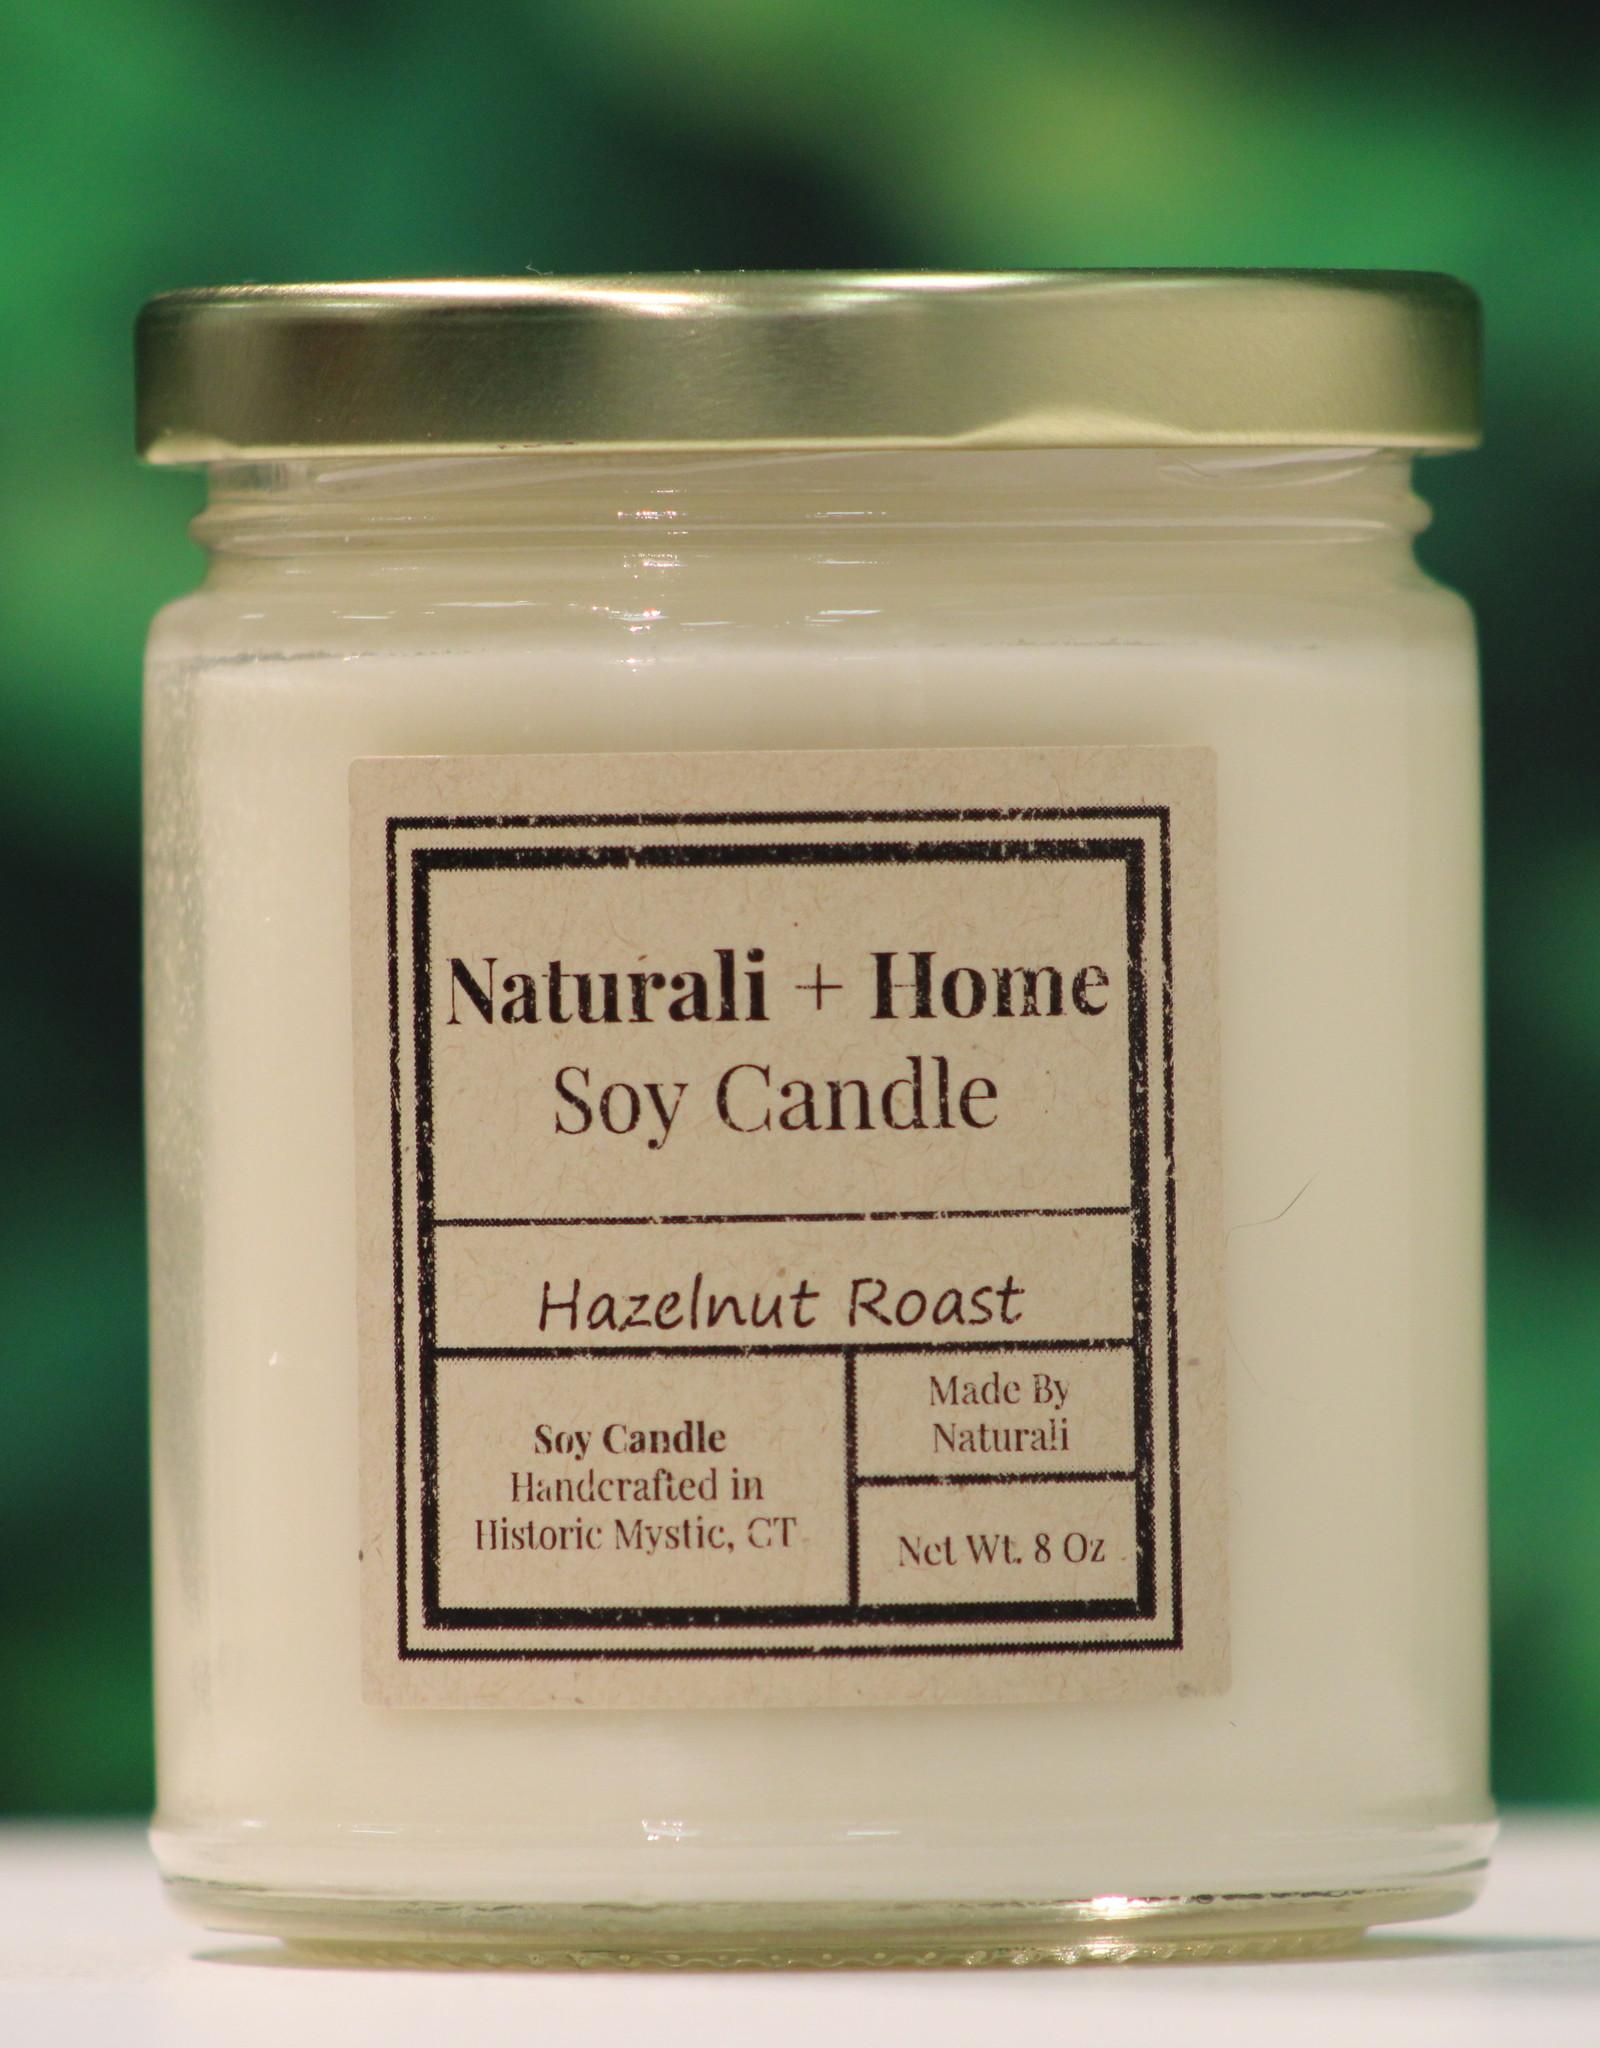 Naturali Home Hazelnut Roast Soy Candle (8oz)